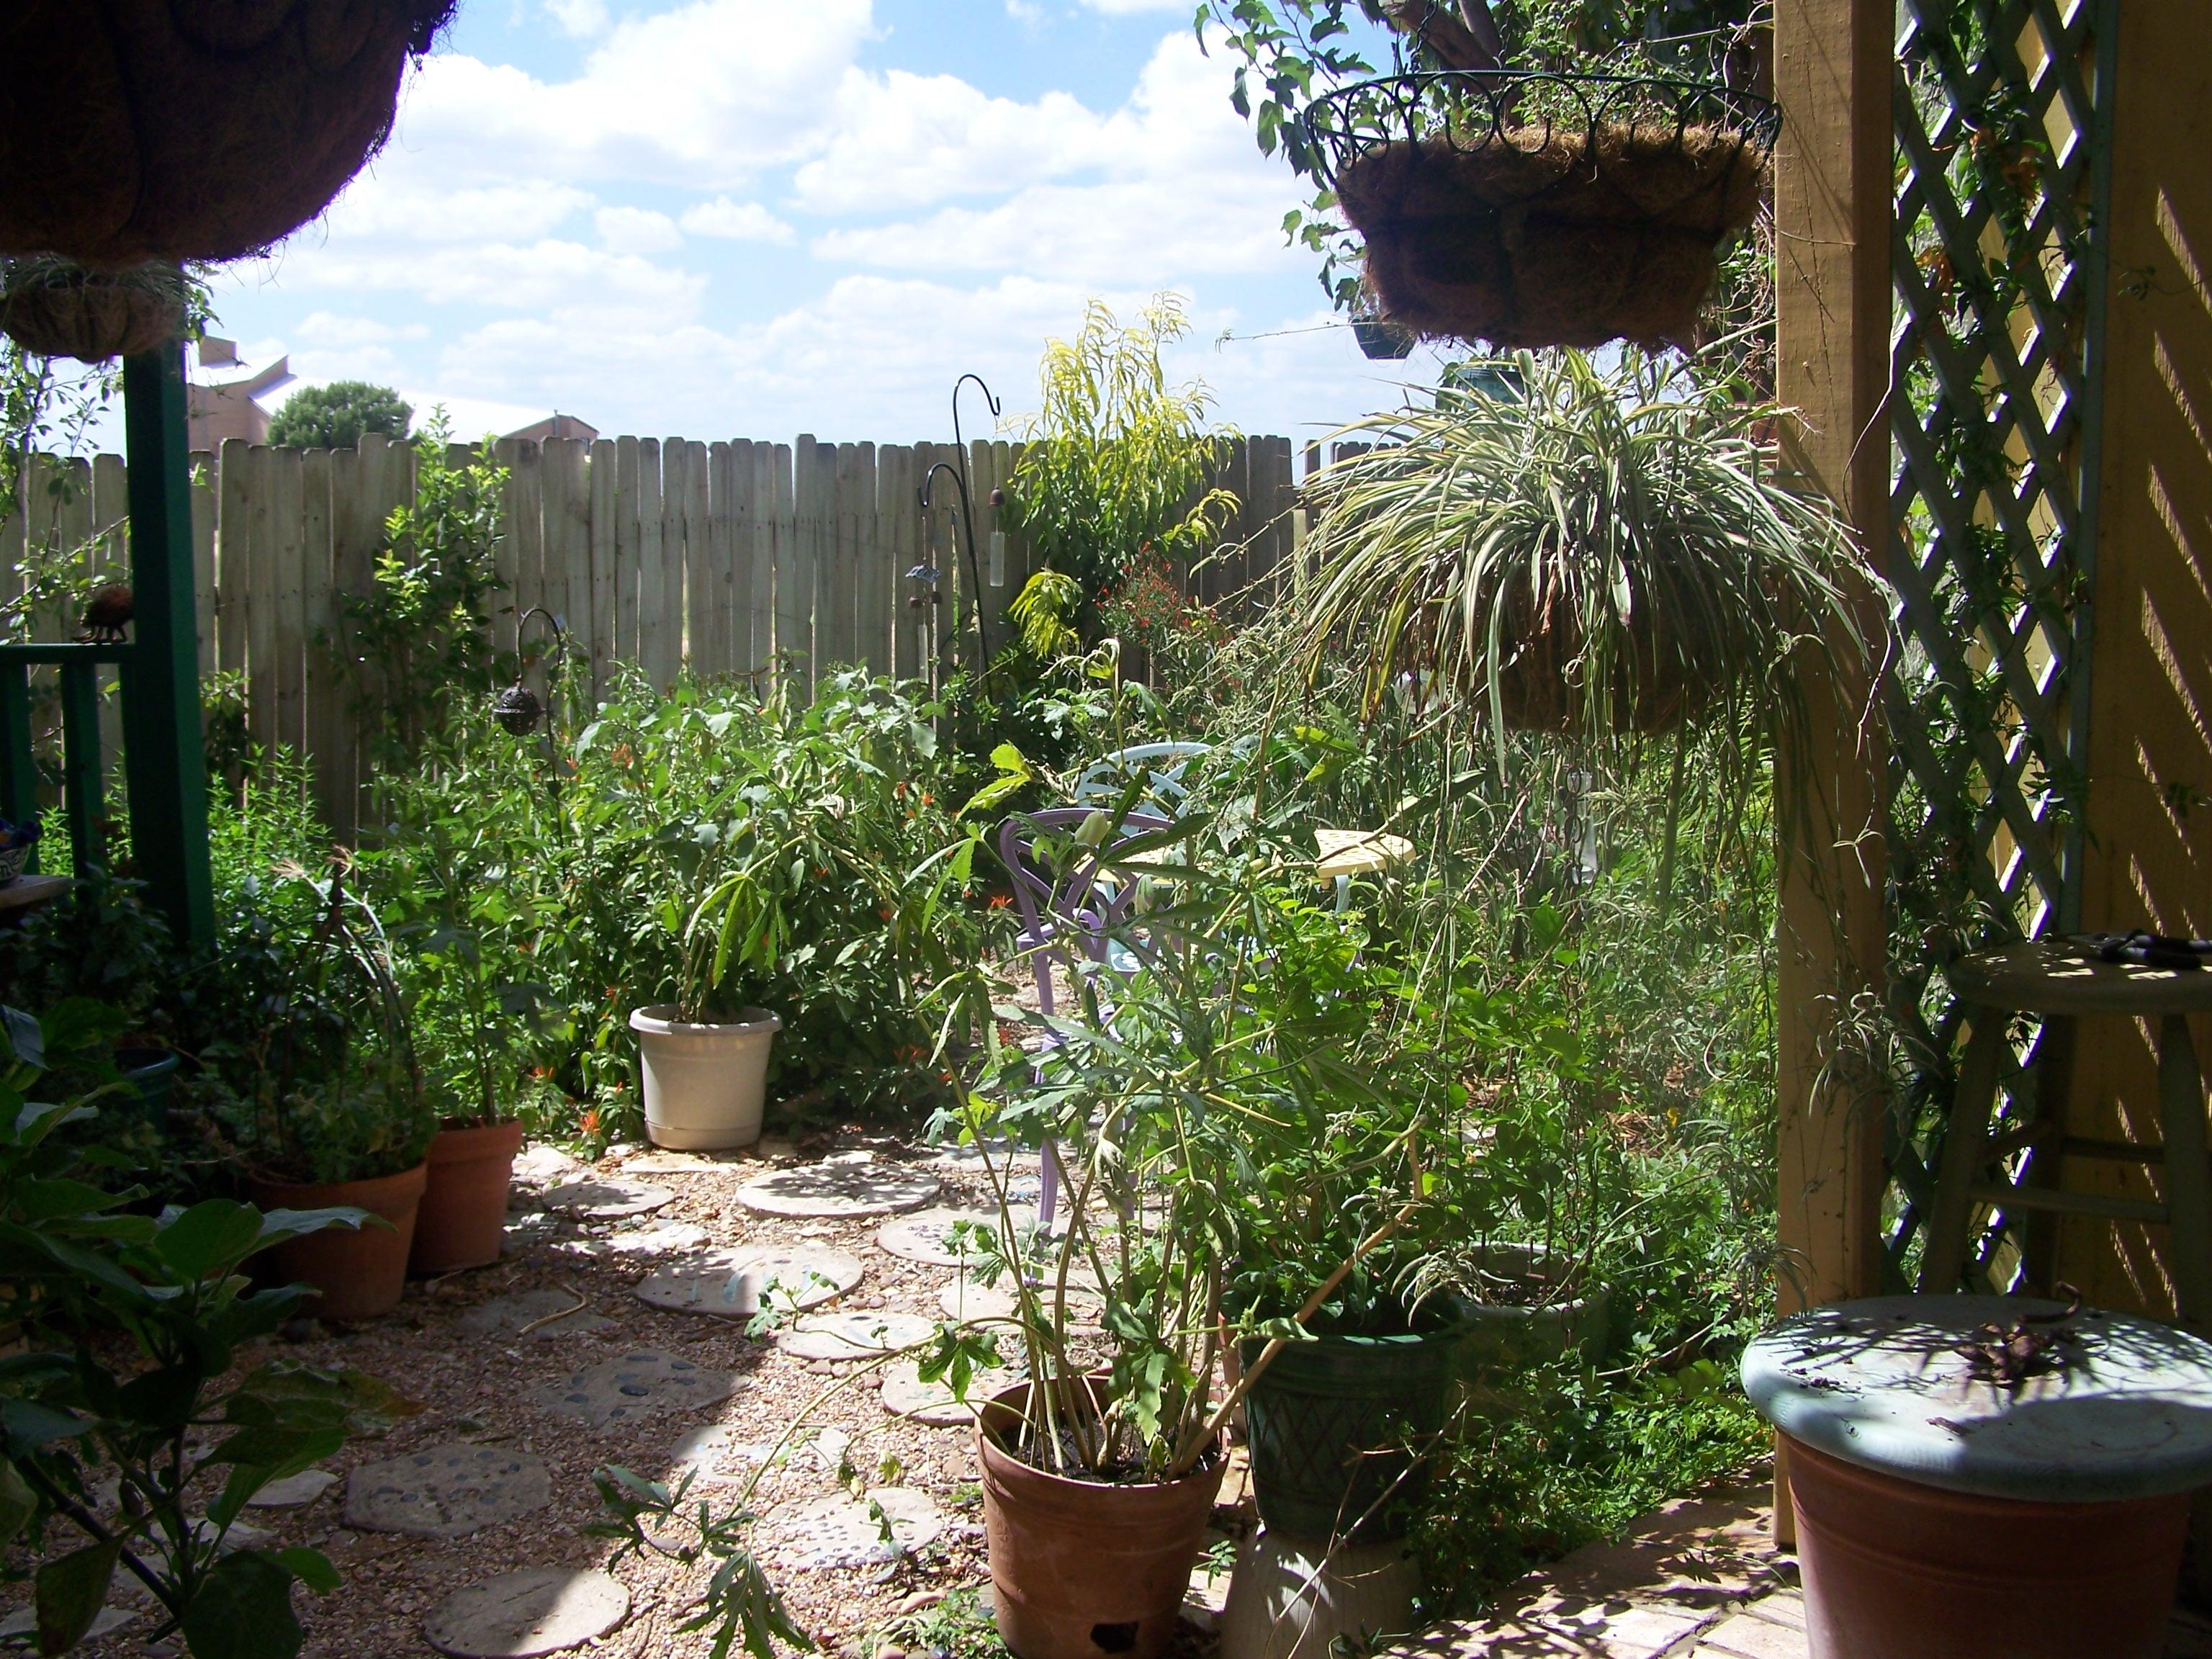 Wartime Kitchen Garden Dvd September 2014 Celia Hayes The Accidental Texan